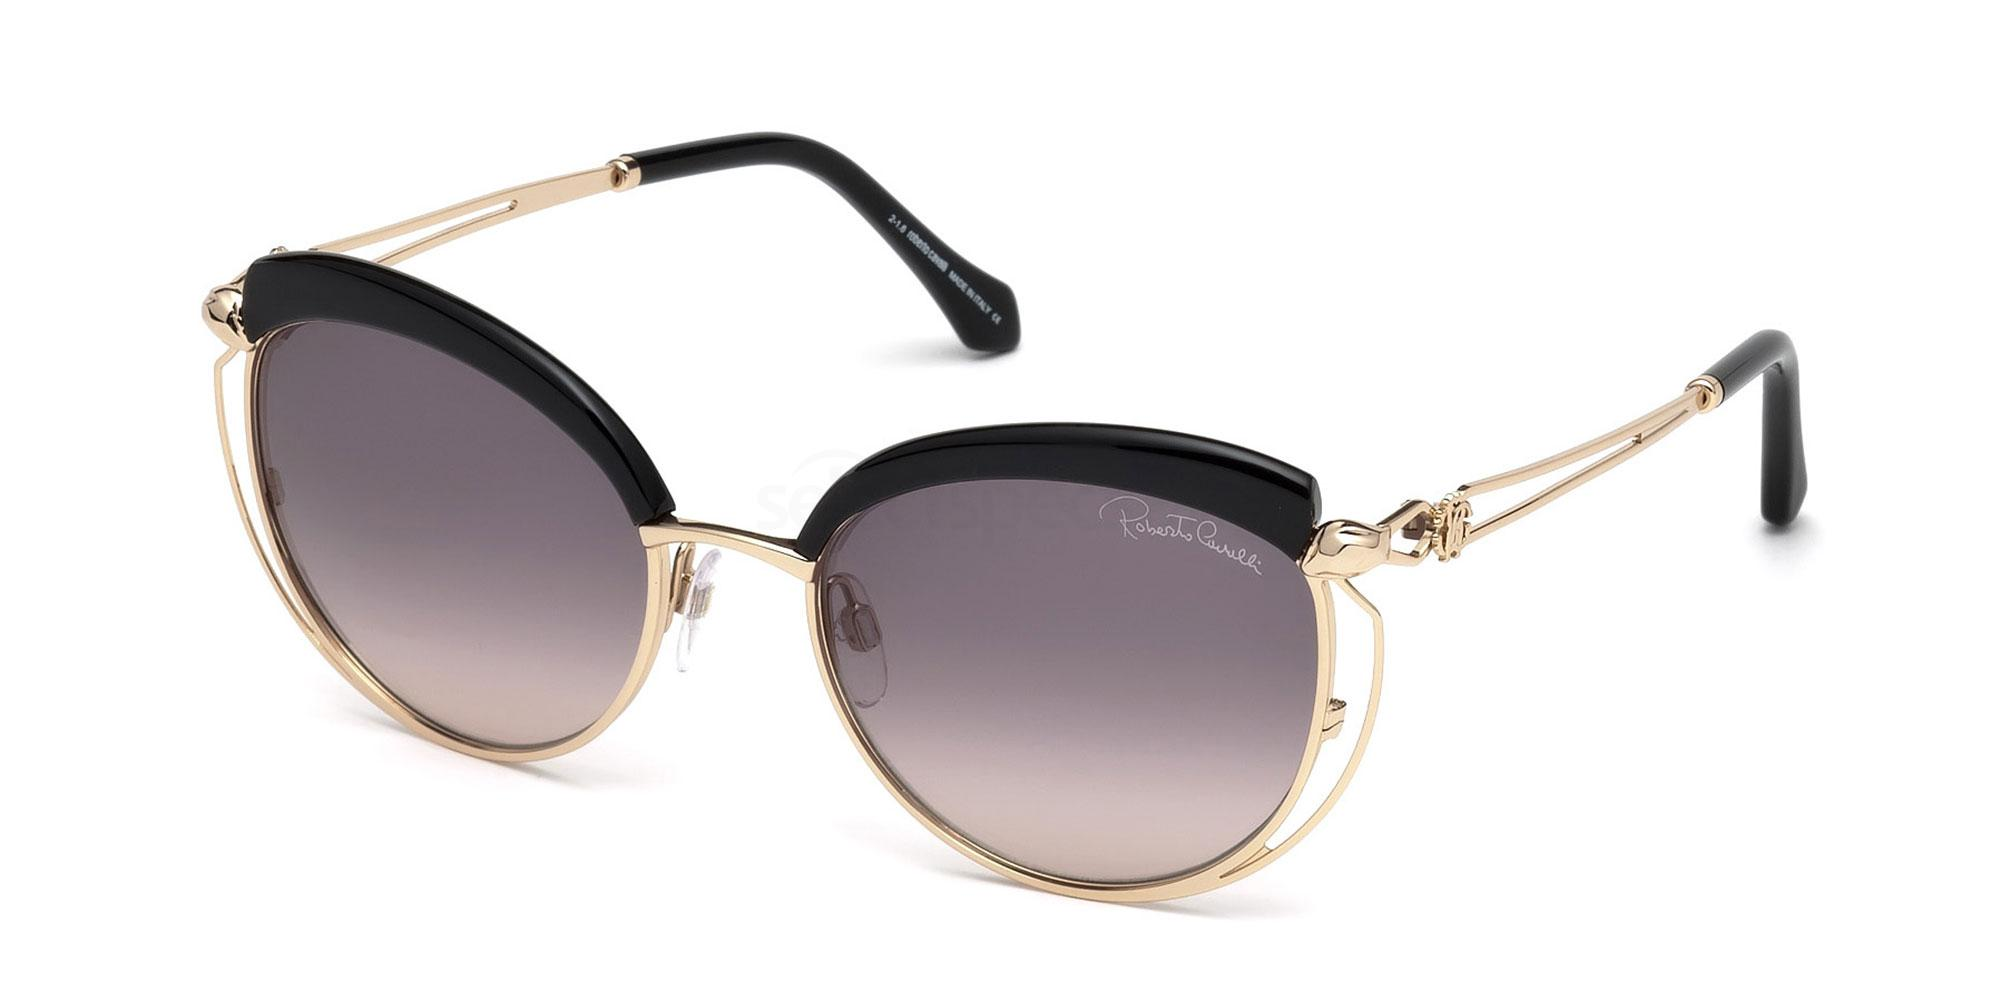 01B RC1032 Sunglasses, Roberto Cavalli